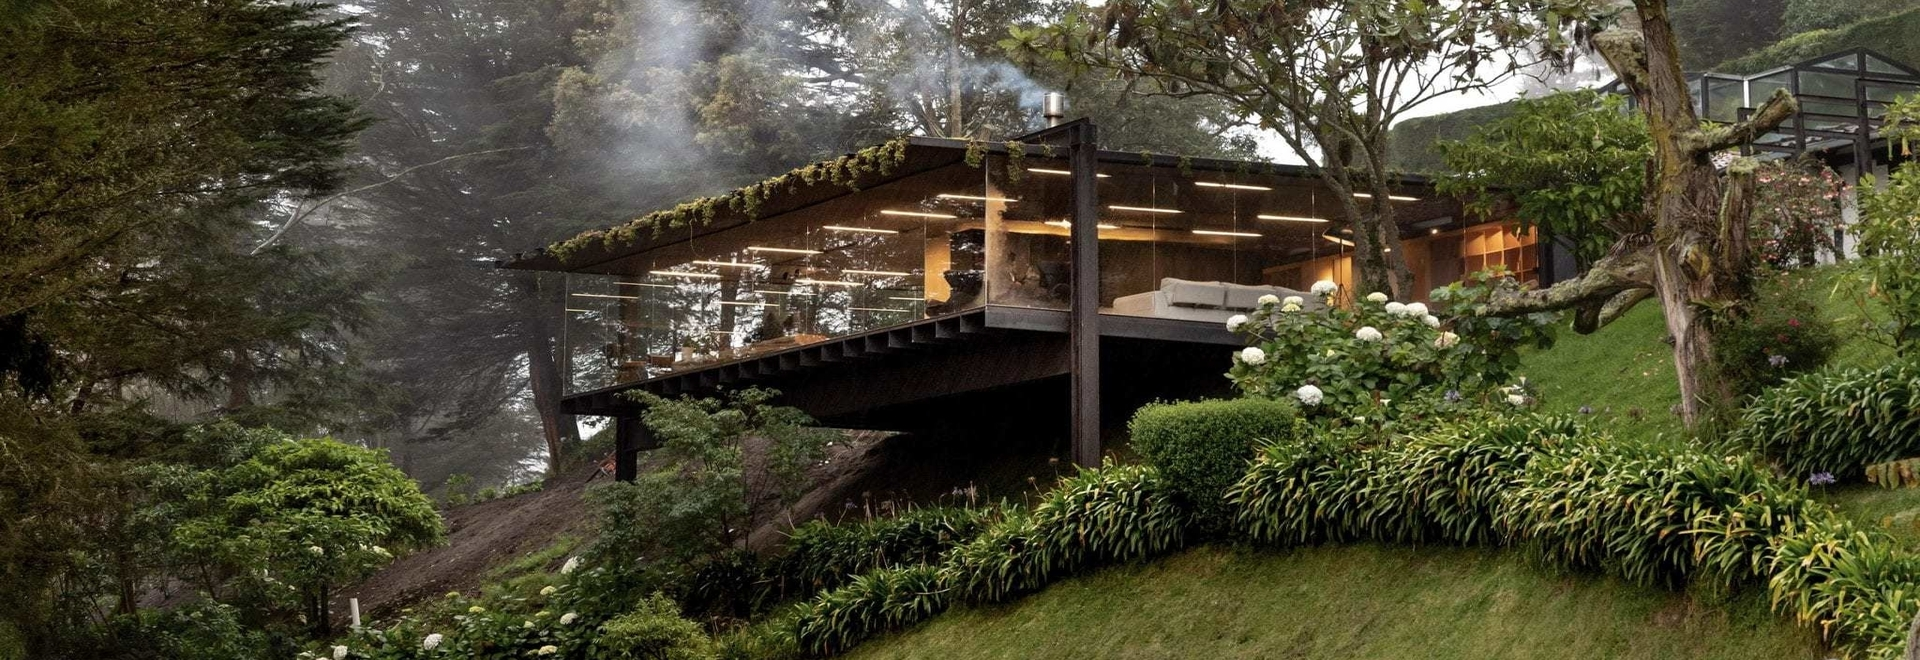 Rama Estudio crea un'aggiunta elevata per Casa Mirador in Ecuador